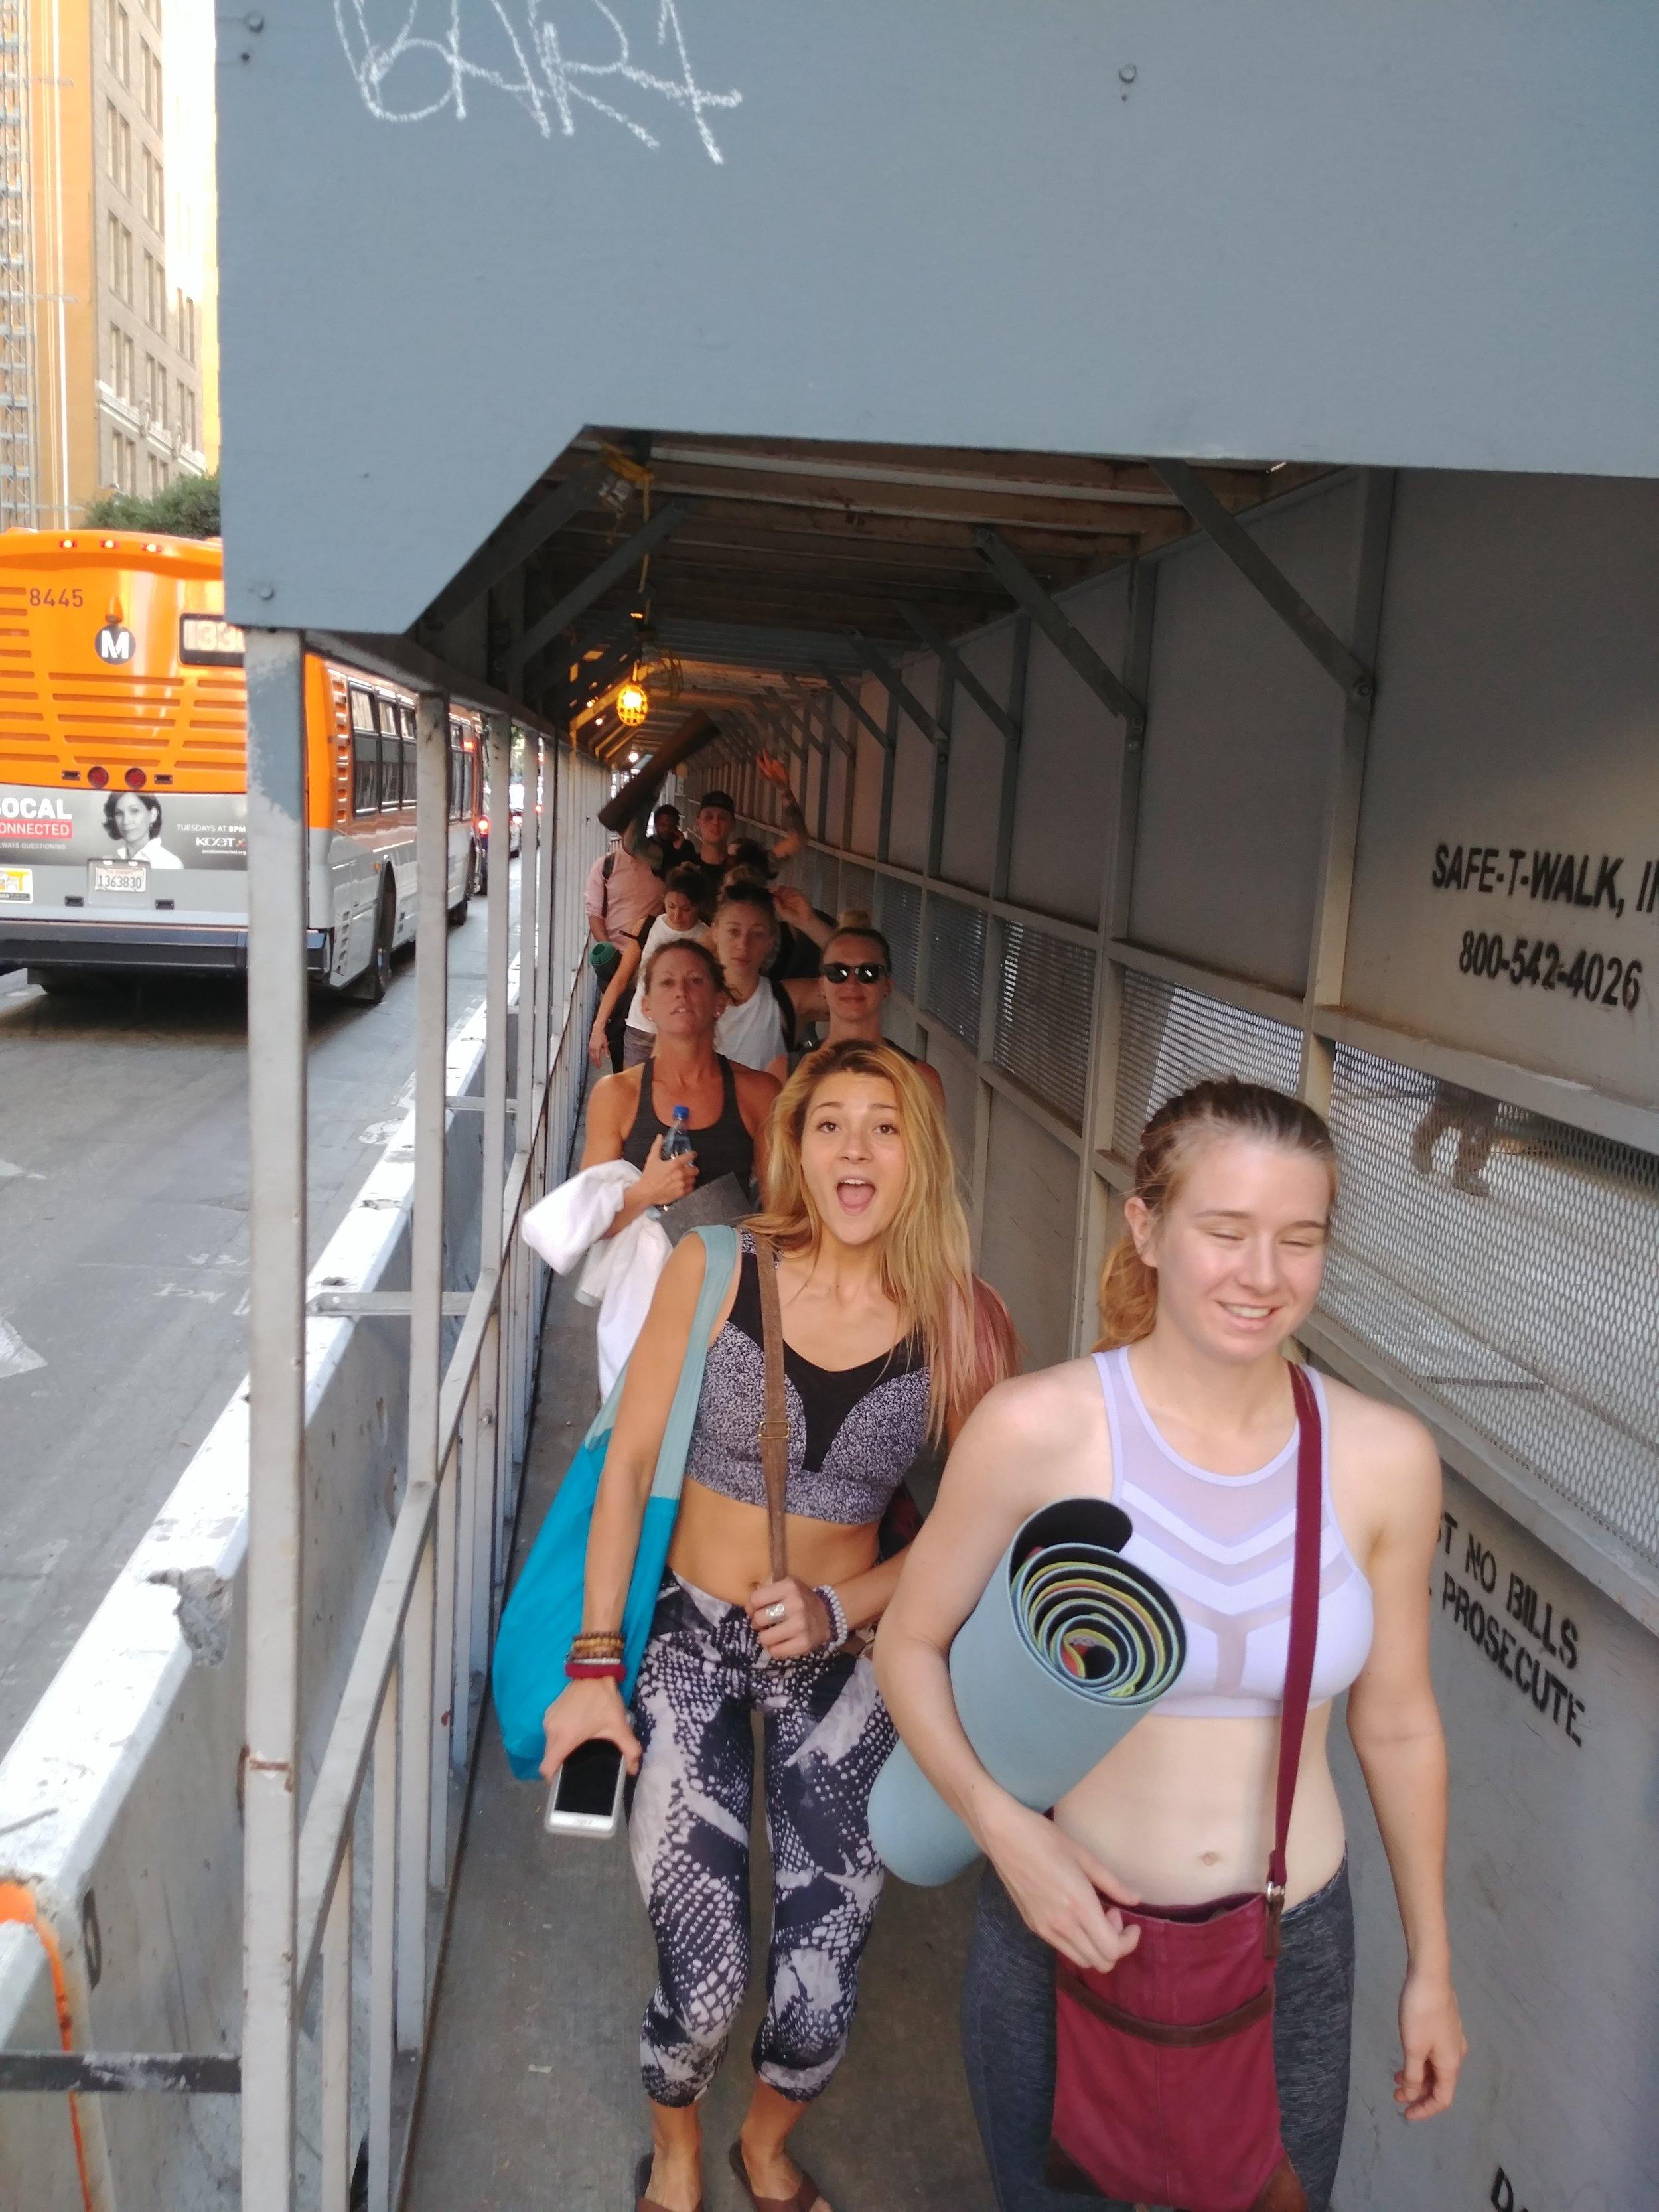 Fuel Yoga Workouts Downtown Portland Heated  Yoga Power Vinyasa 826 SW 2nd Ave Portland Oregon 97204 971-213-3835 DILA 19.jpg